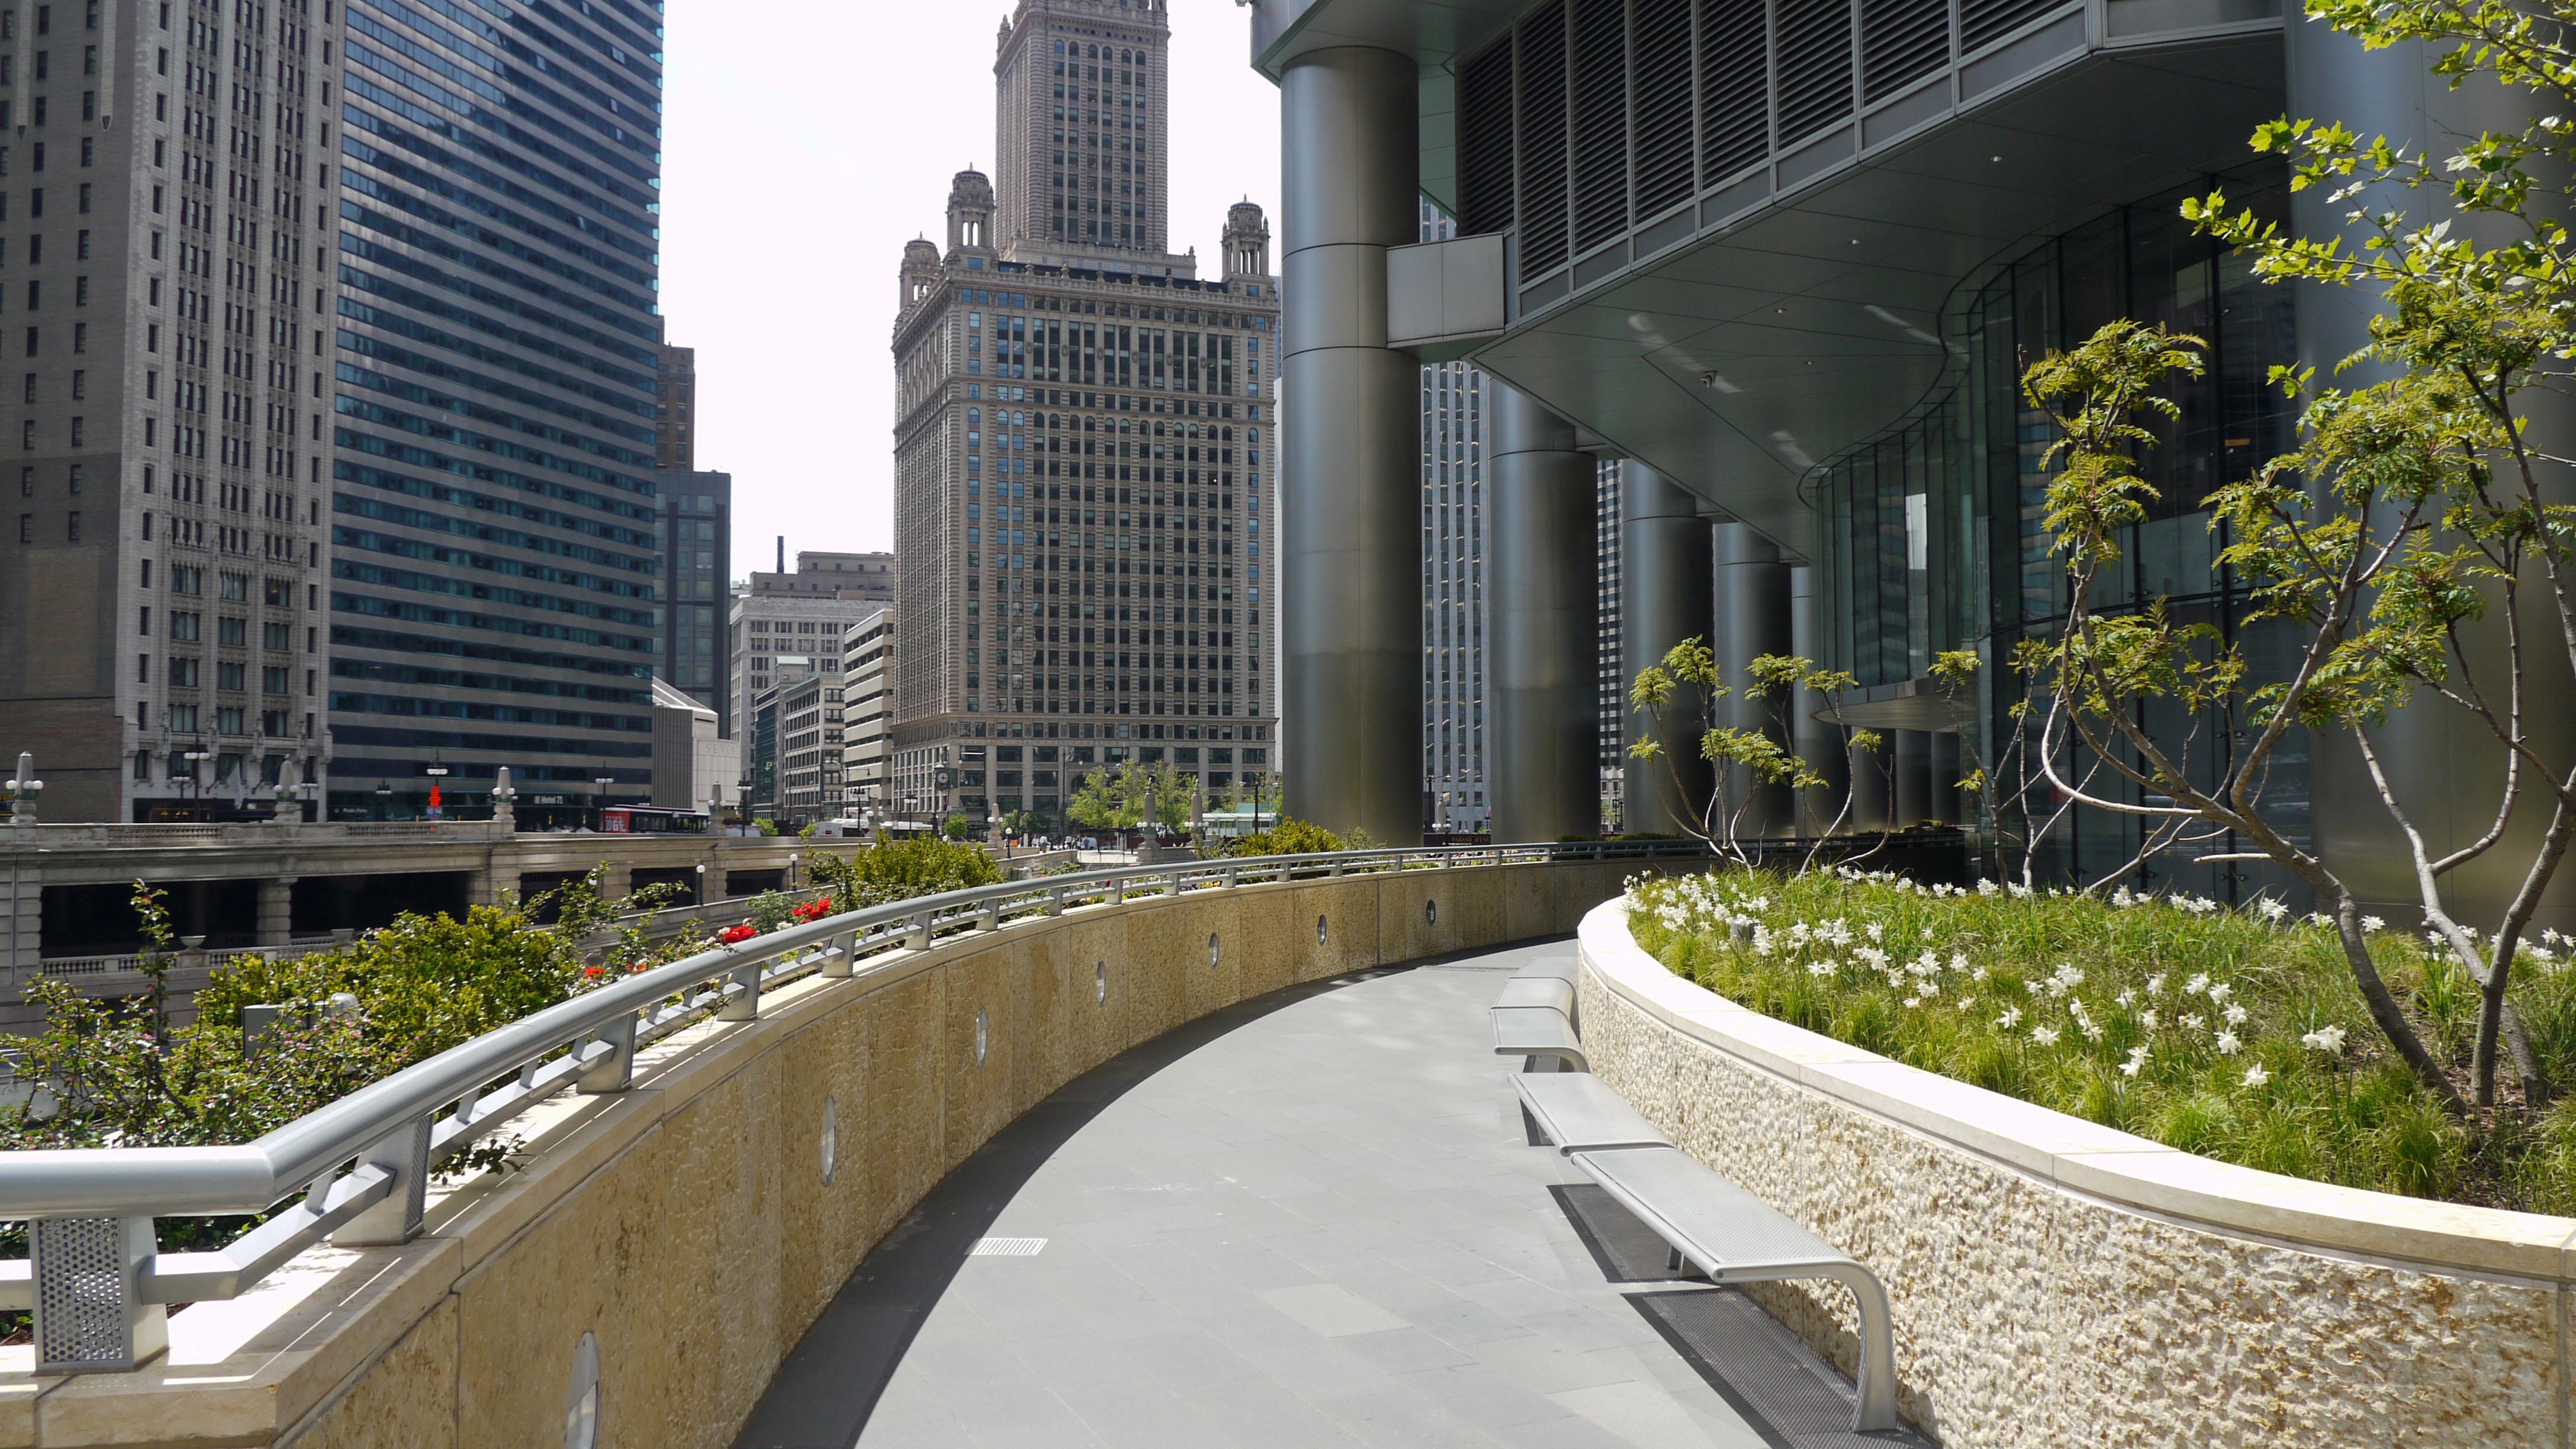 Trump Riverwalk, 401 N Wabash Ave, Chicago